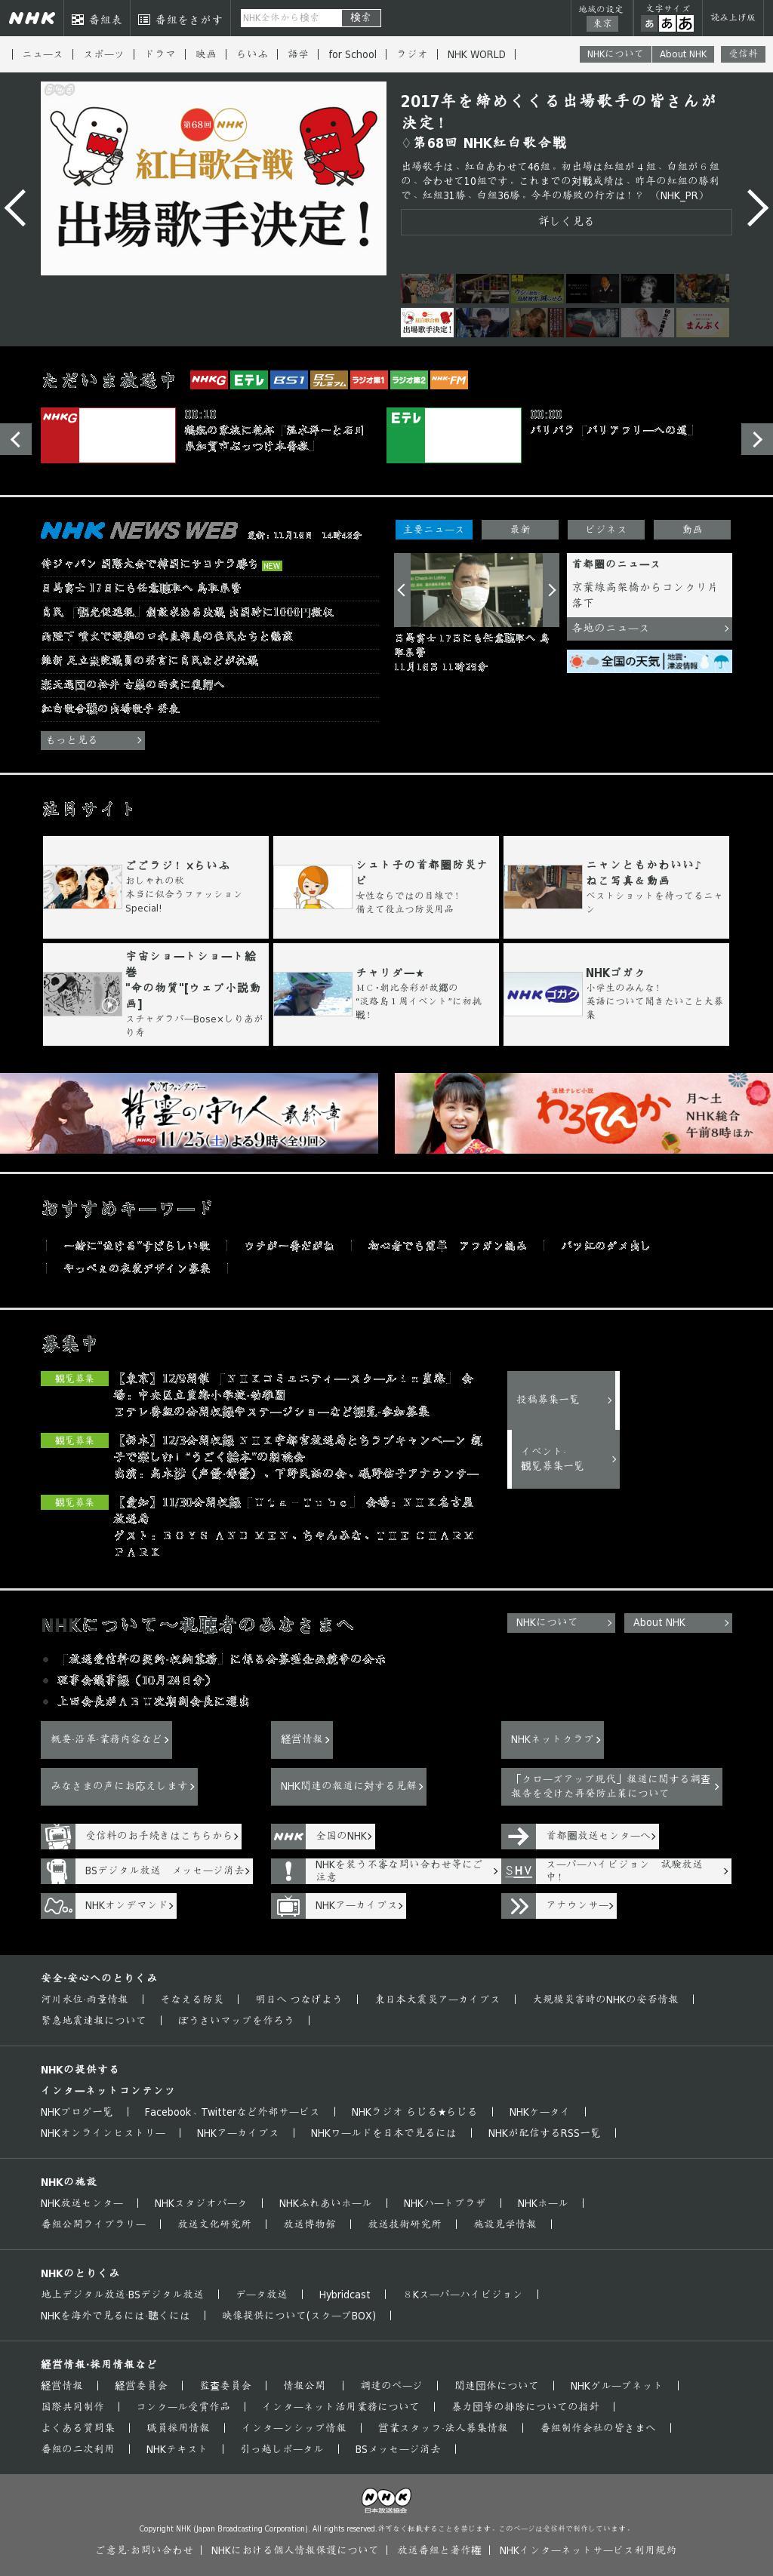 NHK Online at Thursday Nov. 16, 2017, 3:14 p.m. UTC